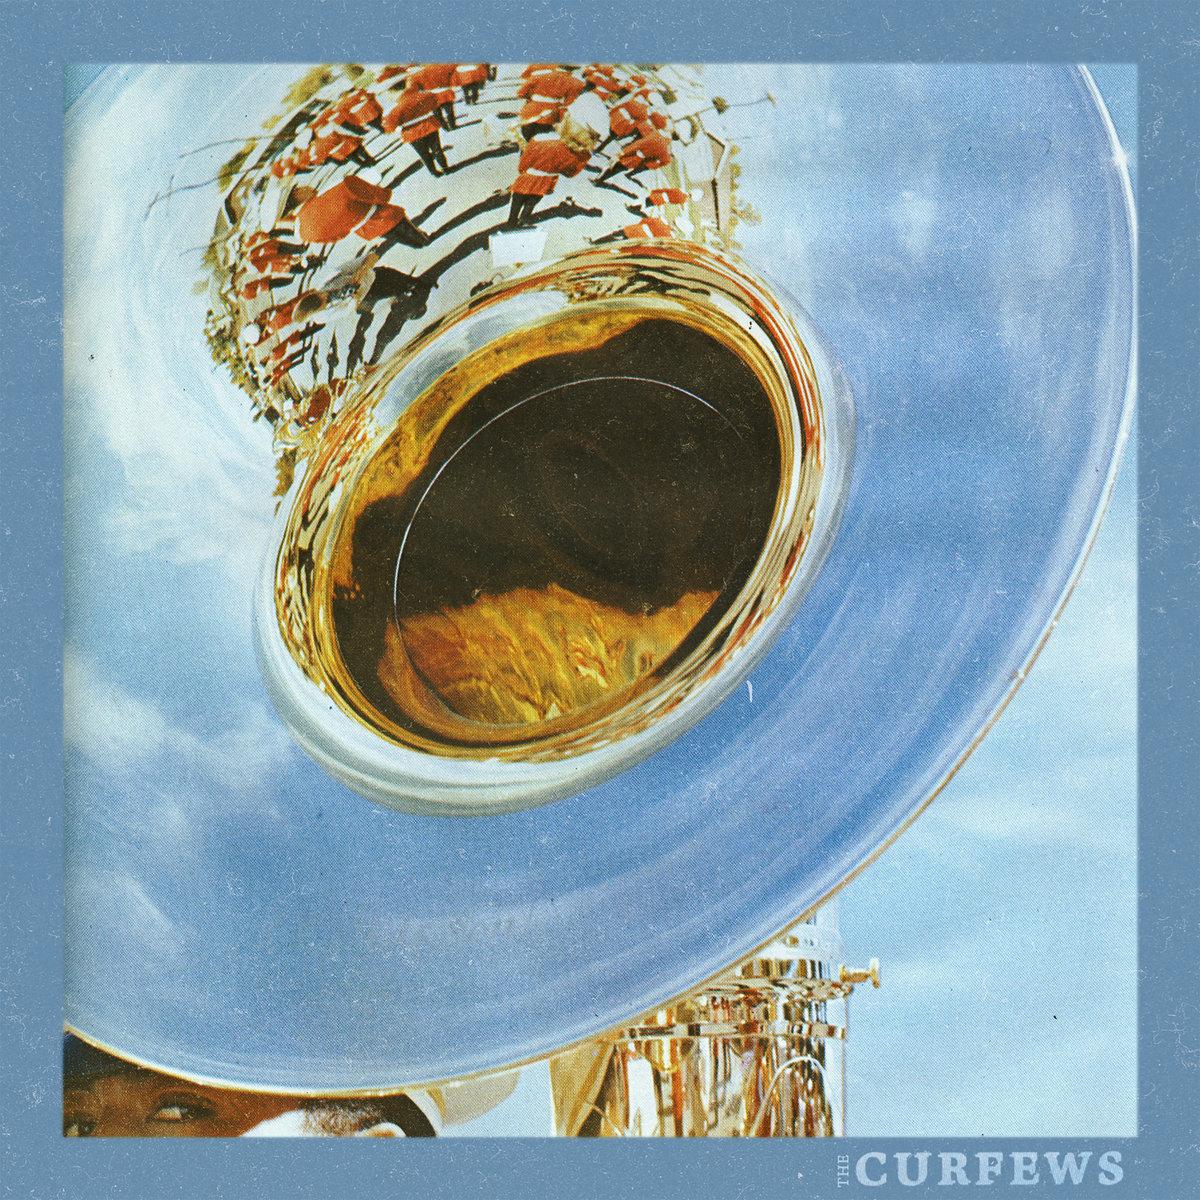 The Curfews – EP